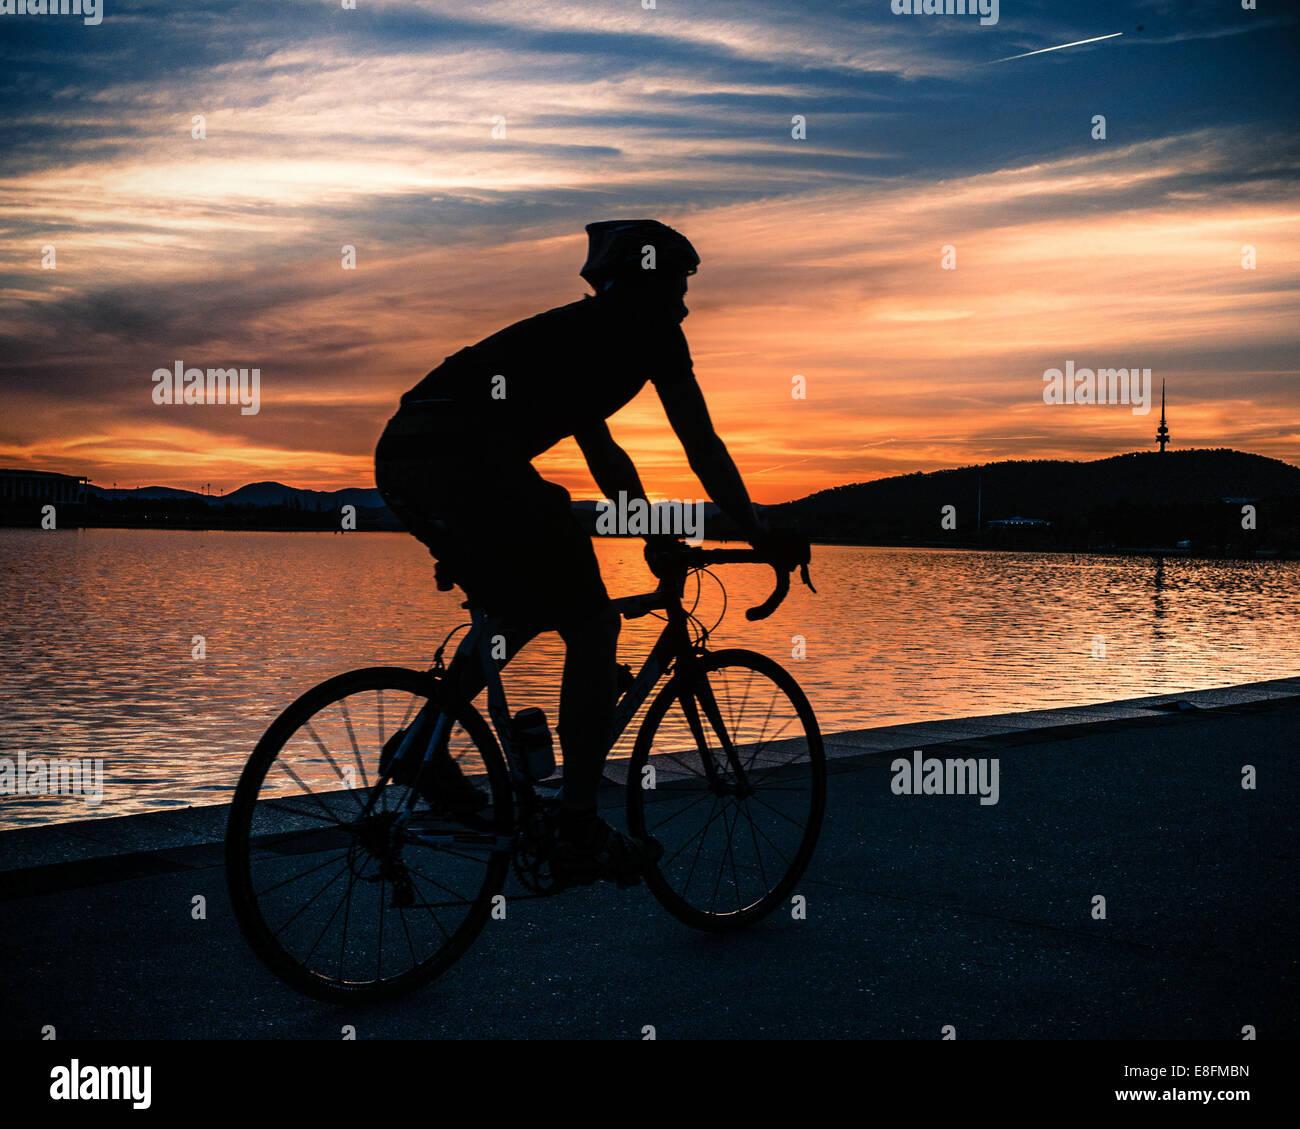 Silueta de ciclista a la puesta del sol cerca del Lago Burley Griffin, Canberra, Australia Imagen De Stock